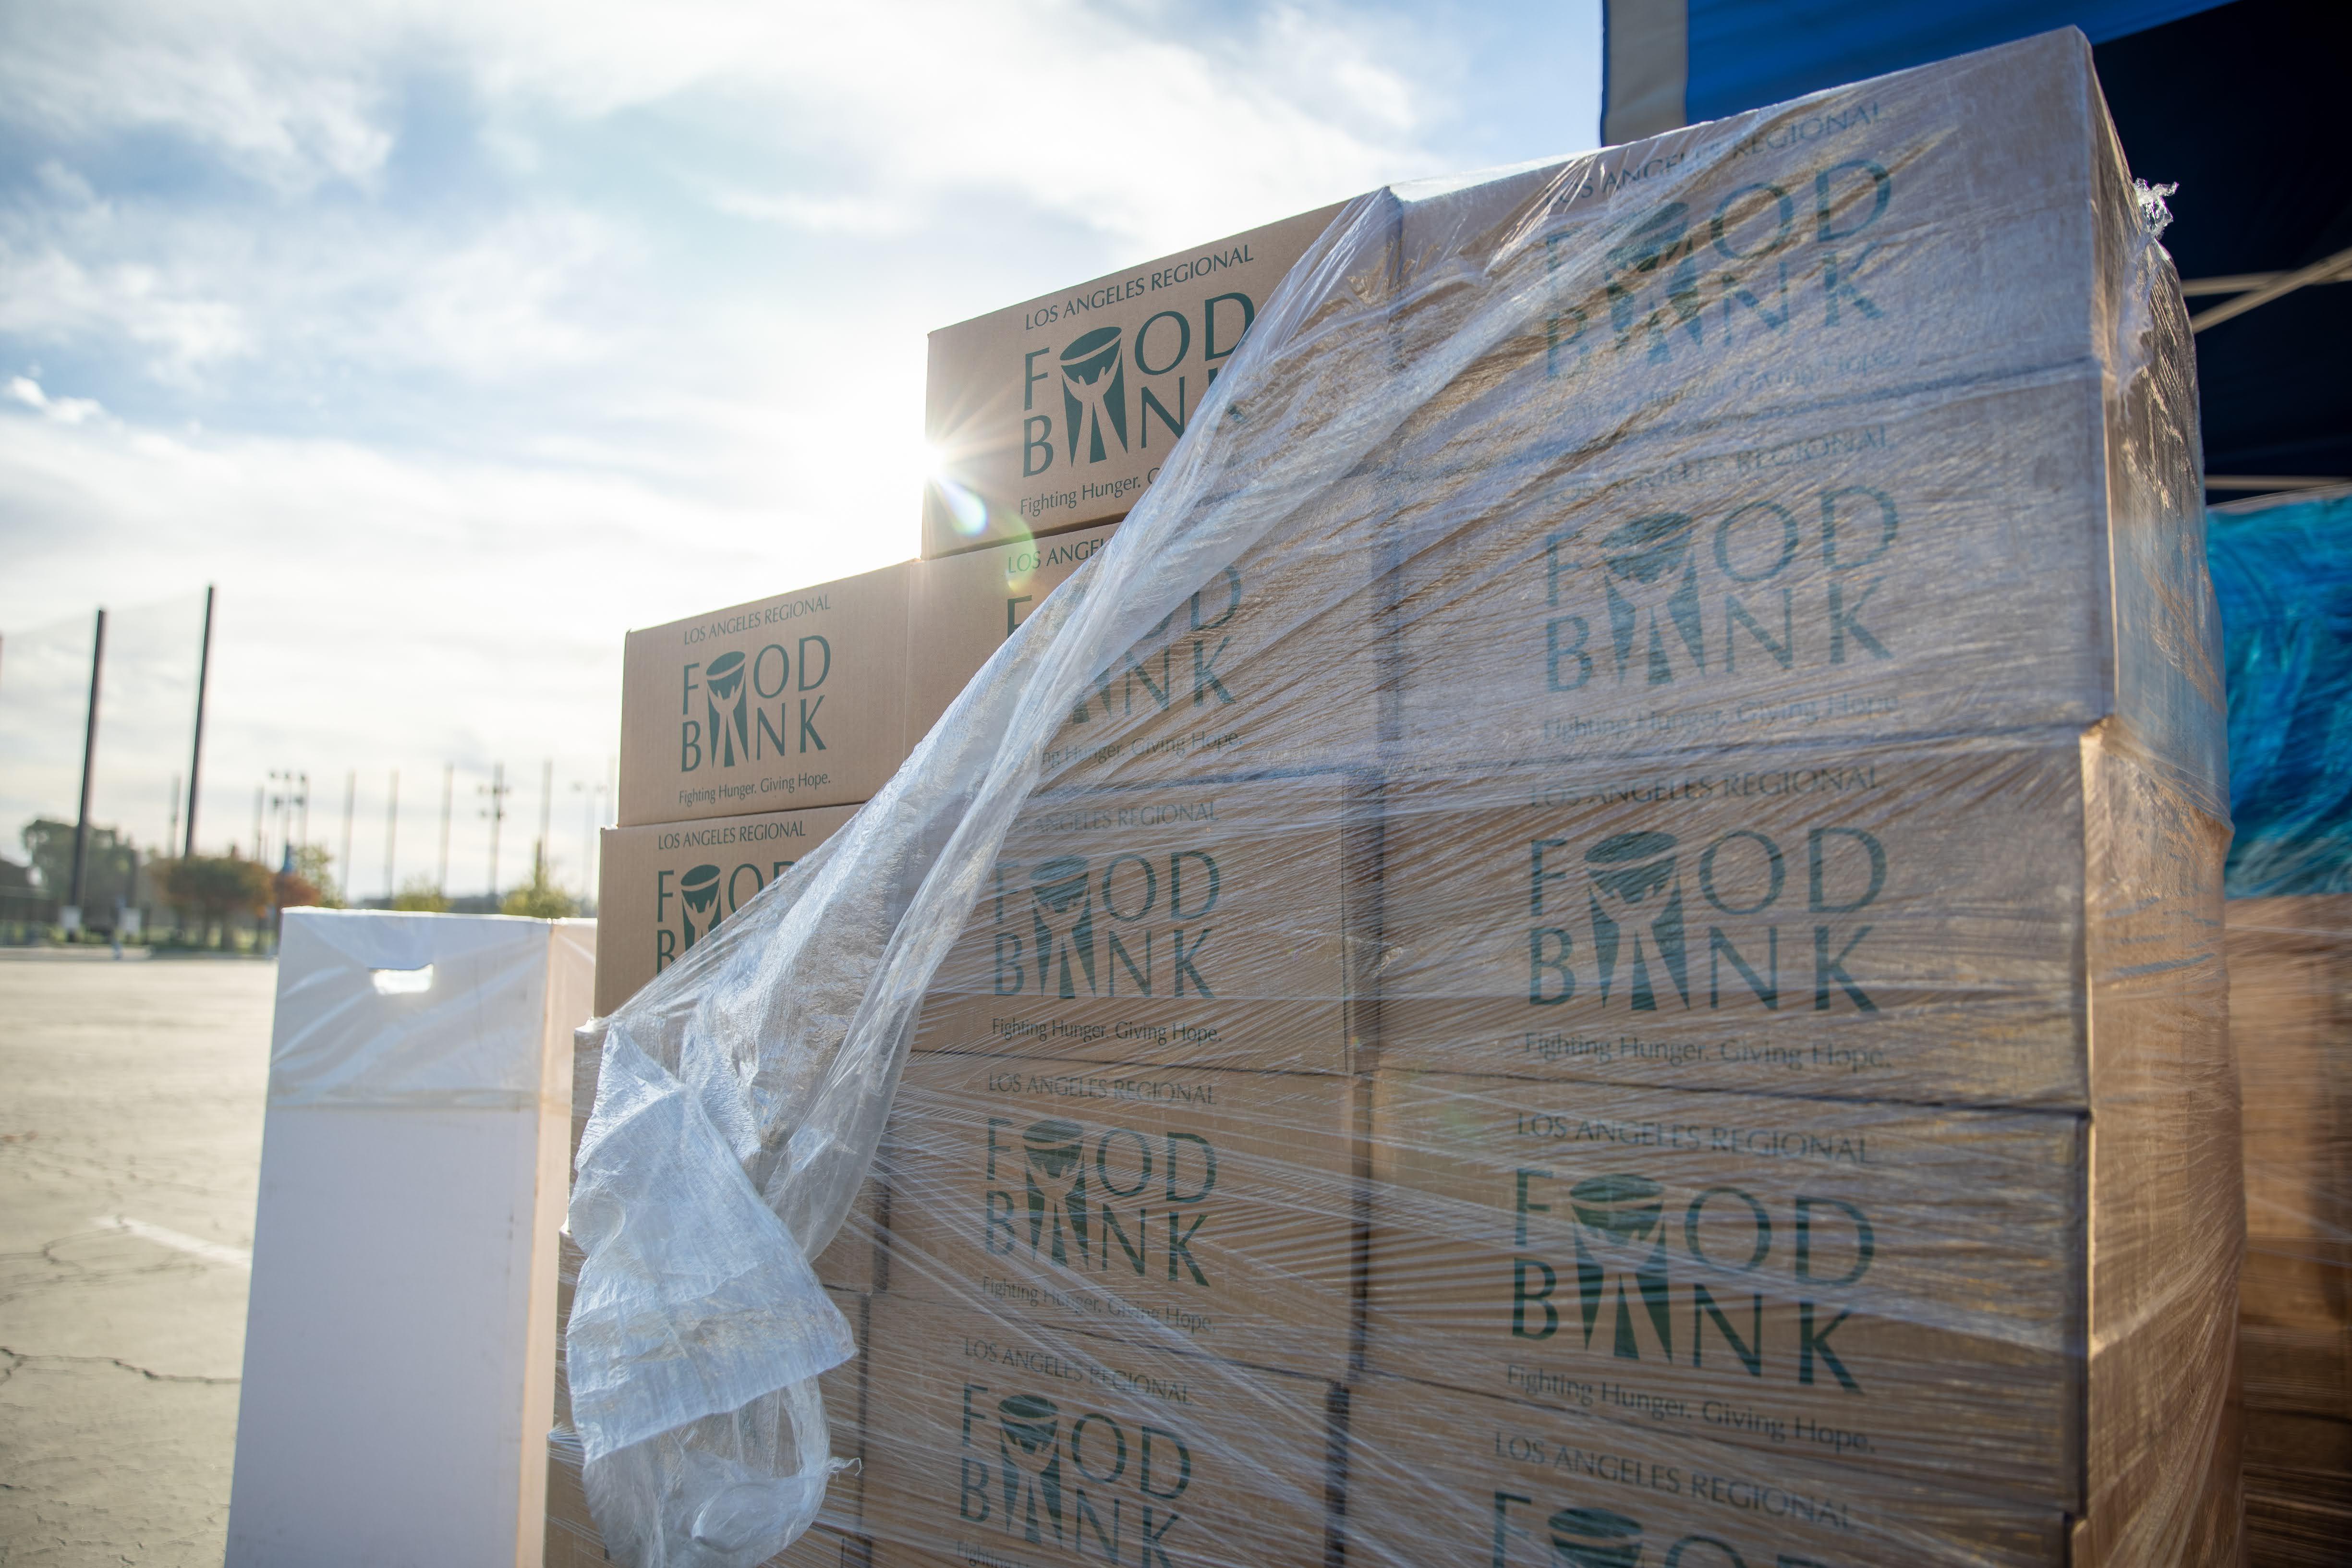 Santa Anita Race Track Free Food Distribution